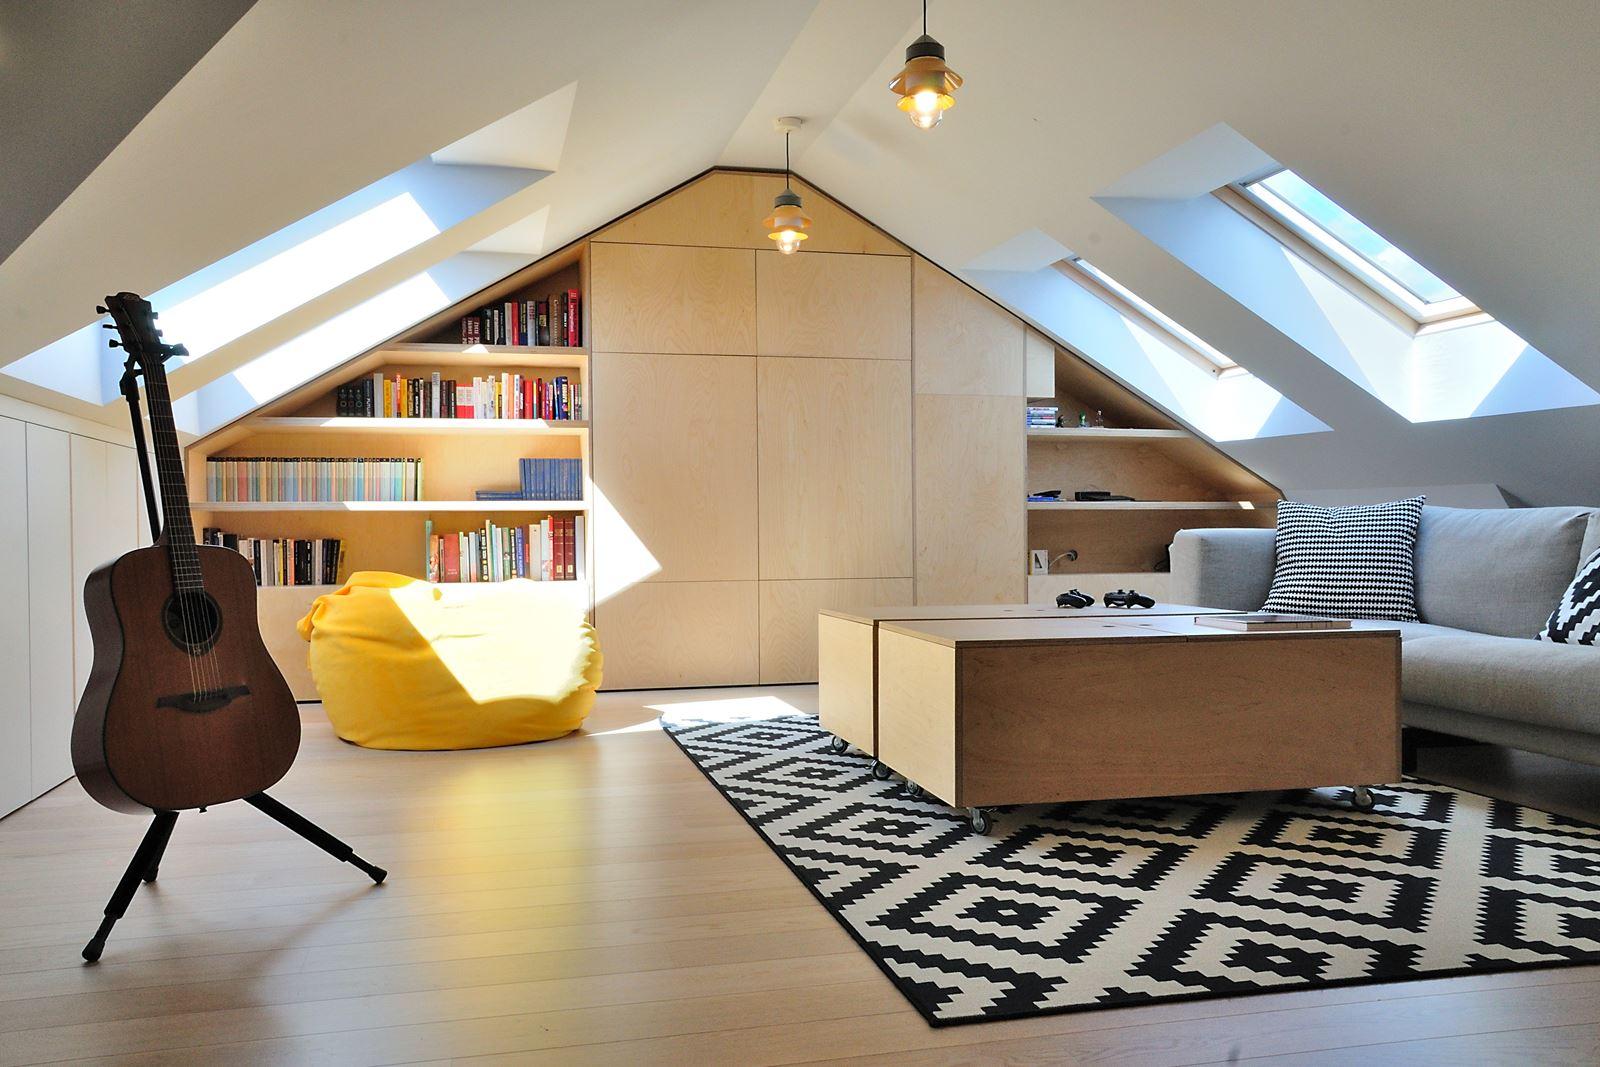 Un duplex con zona relax in mansarda for Foto di mansarde arredate